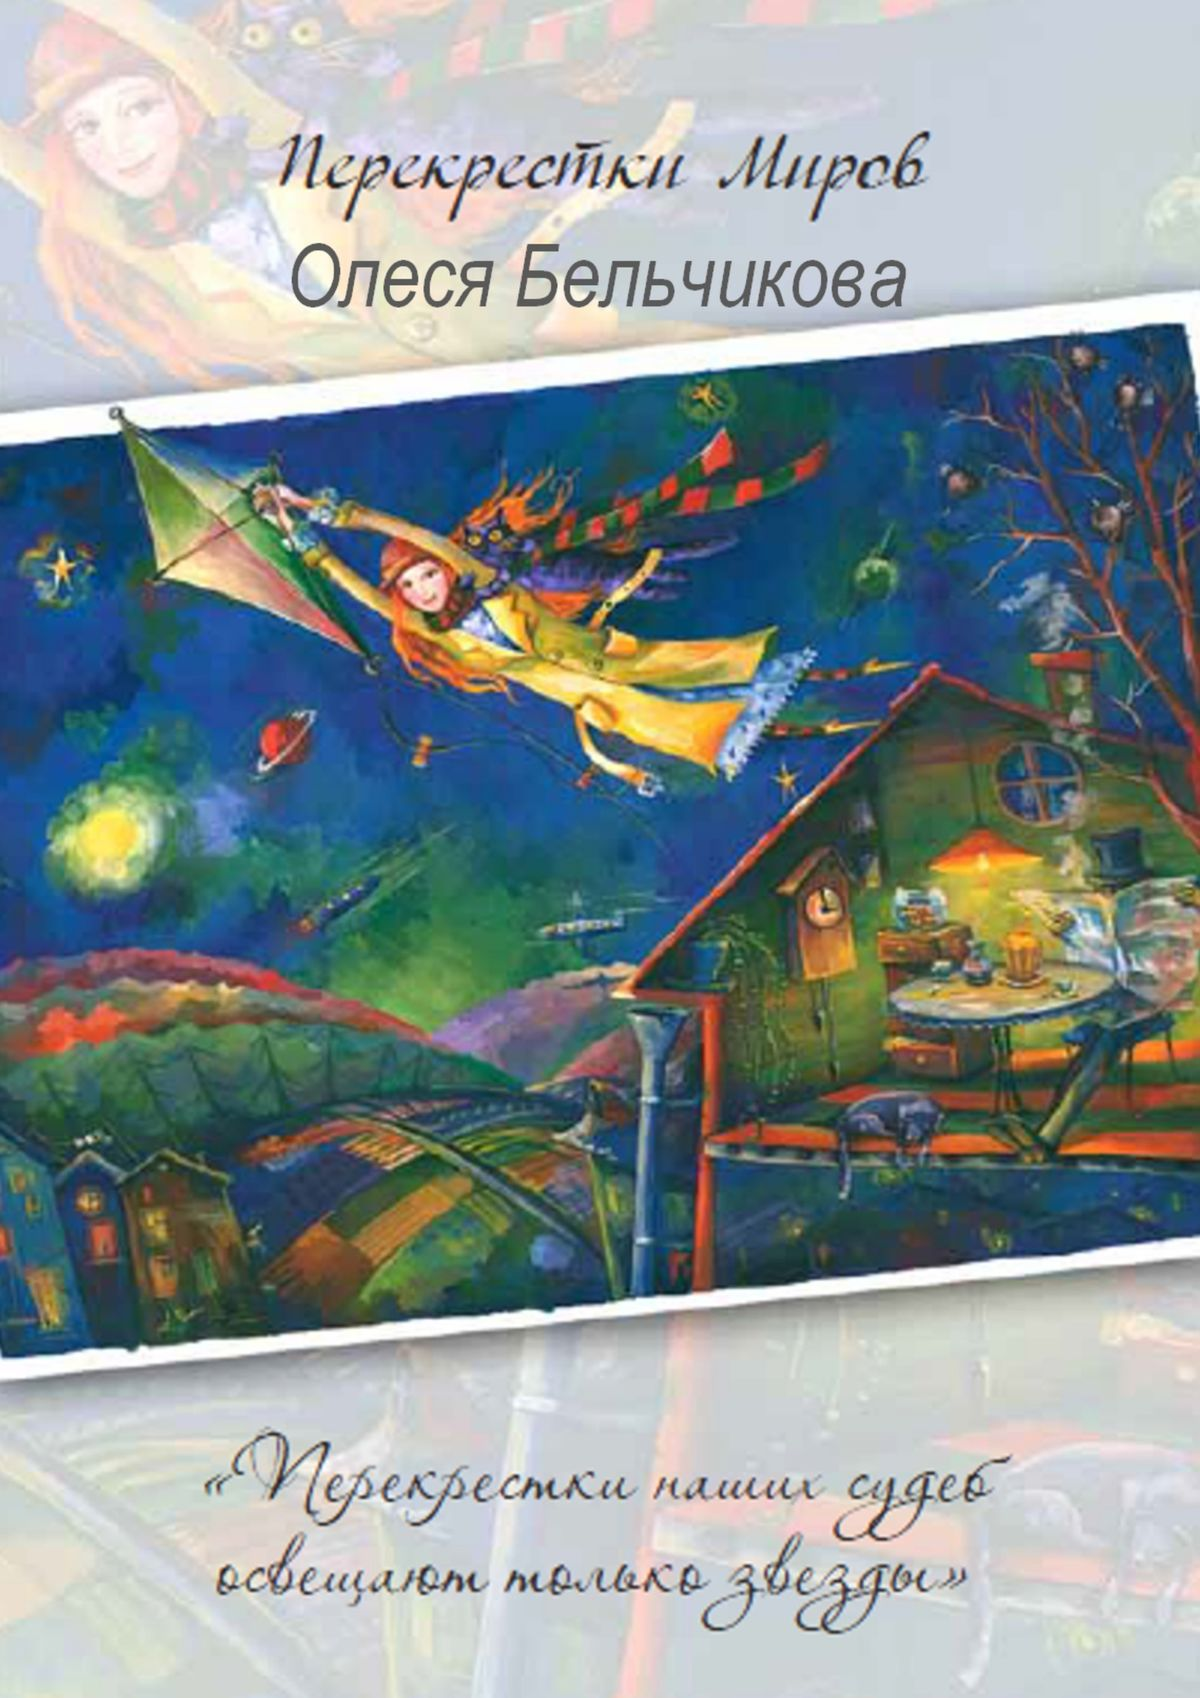 Олеся Бельчикова Перекрестки миров александра борисовна киселёва истории – мои территории стихи